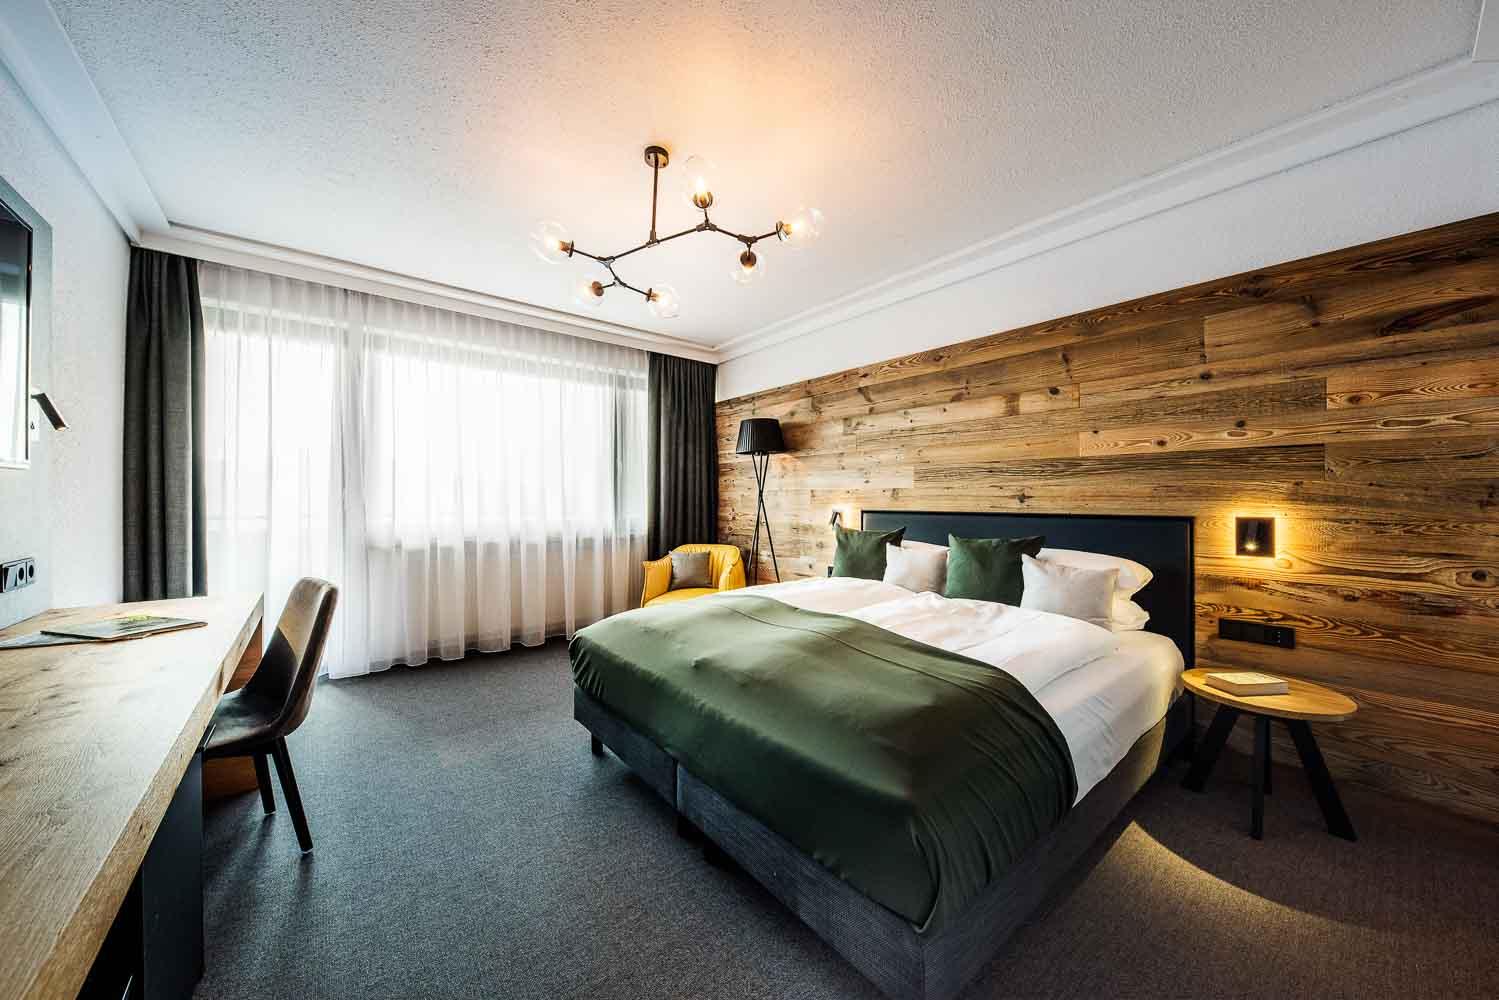 Familie Oswald eröffnet Hotel in Bodenmais   Restaurant ...